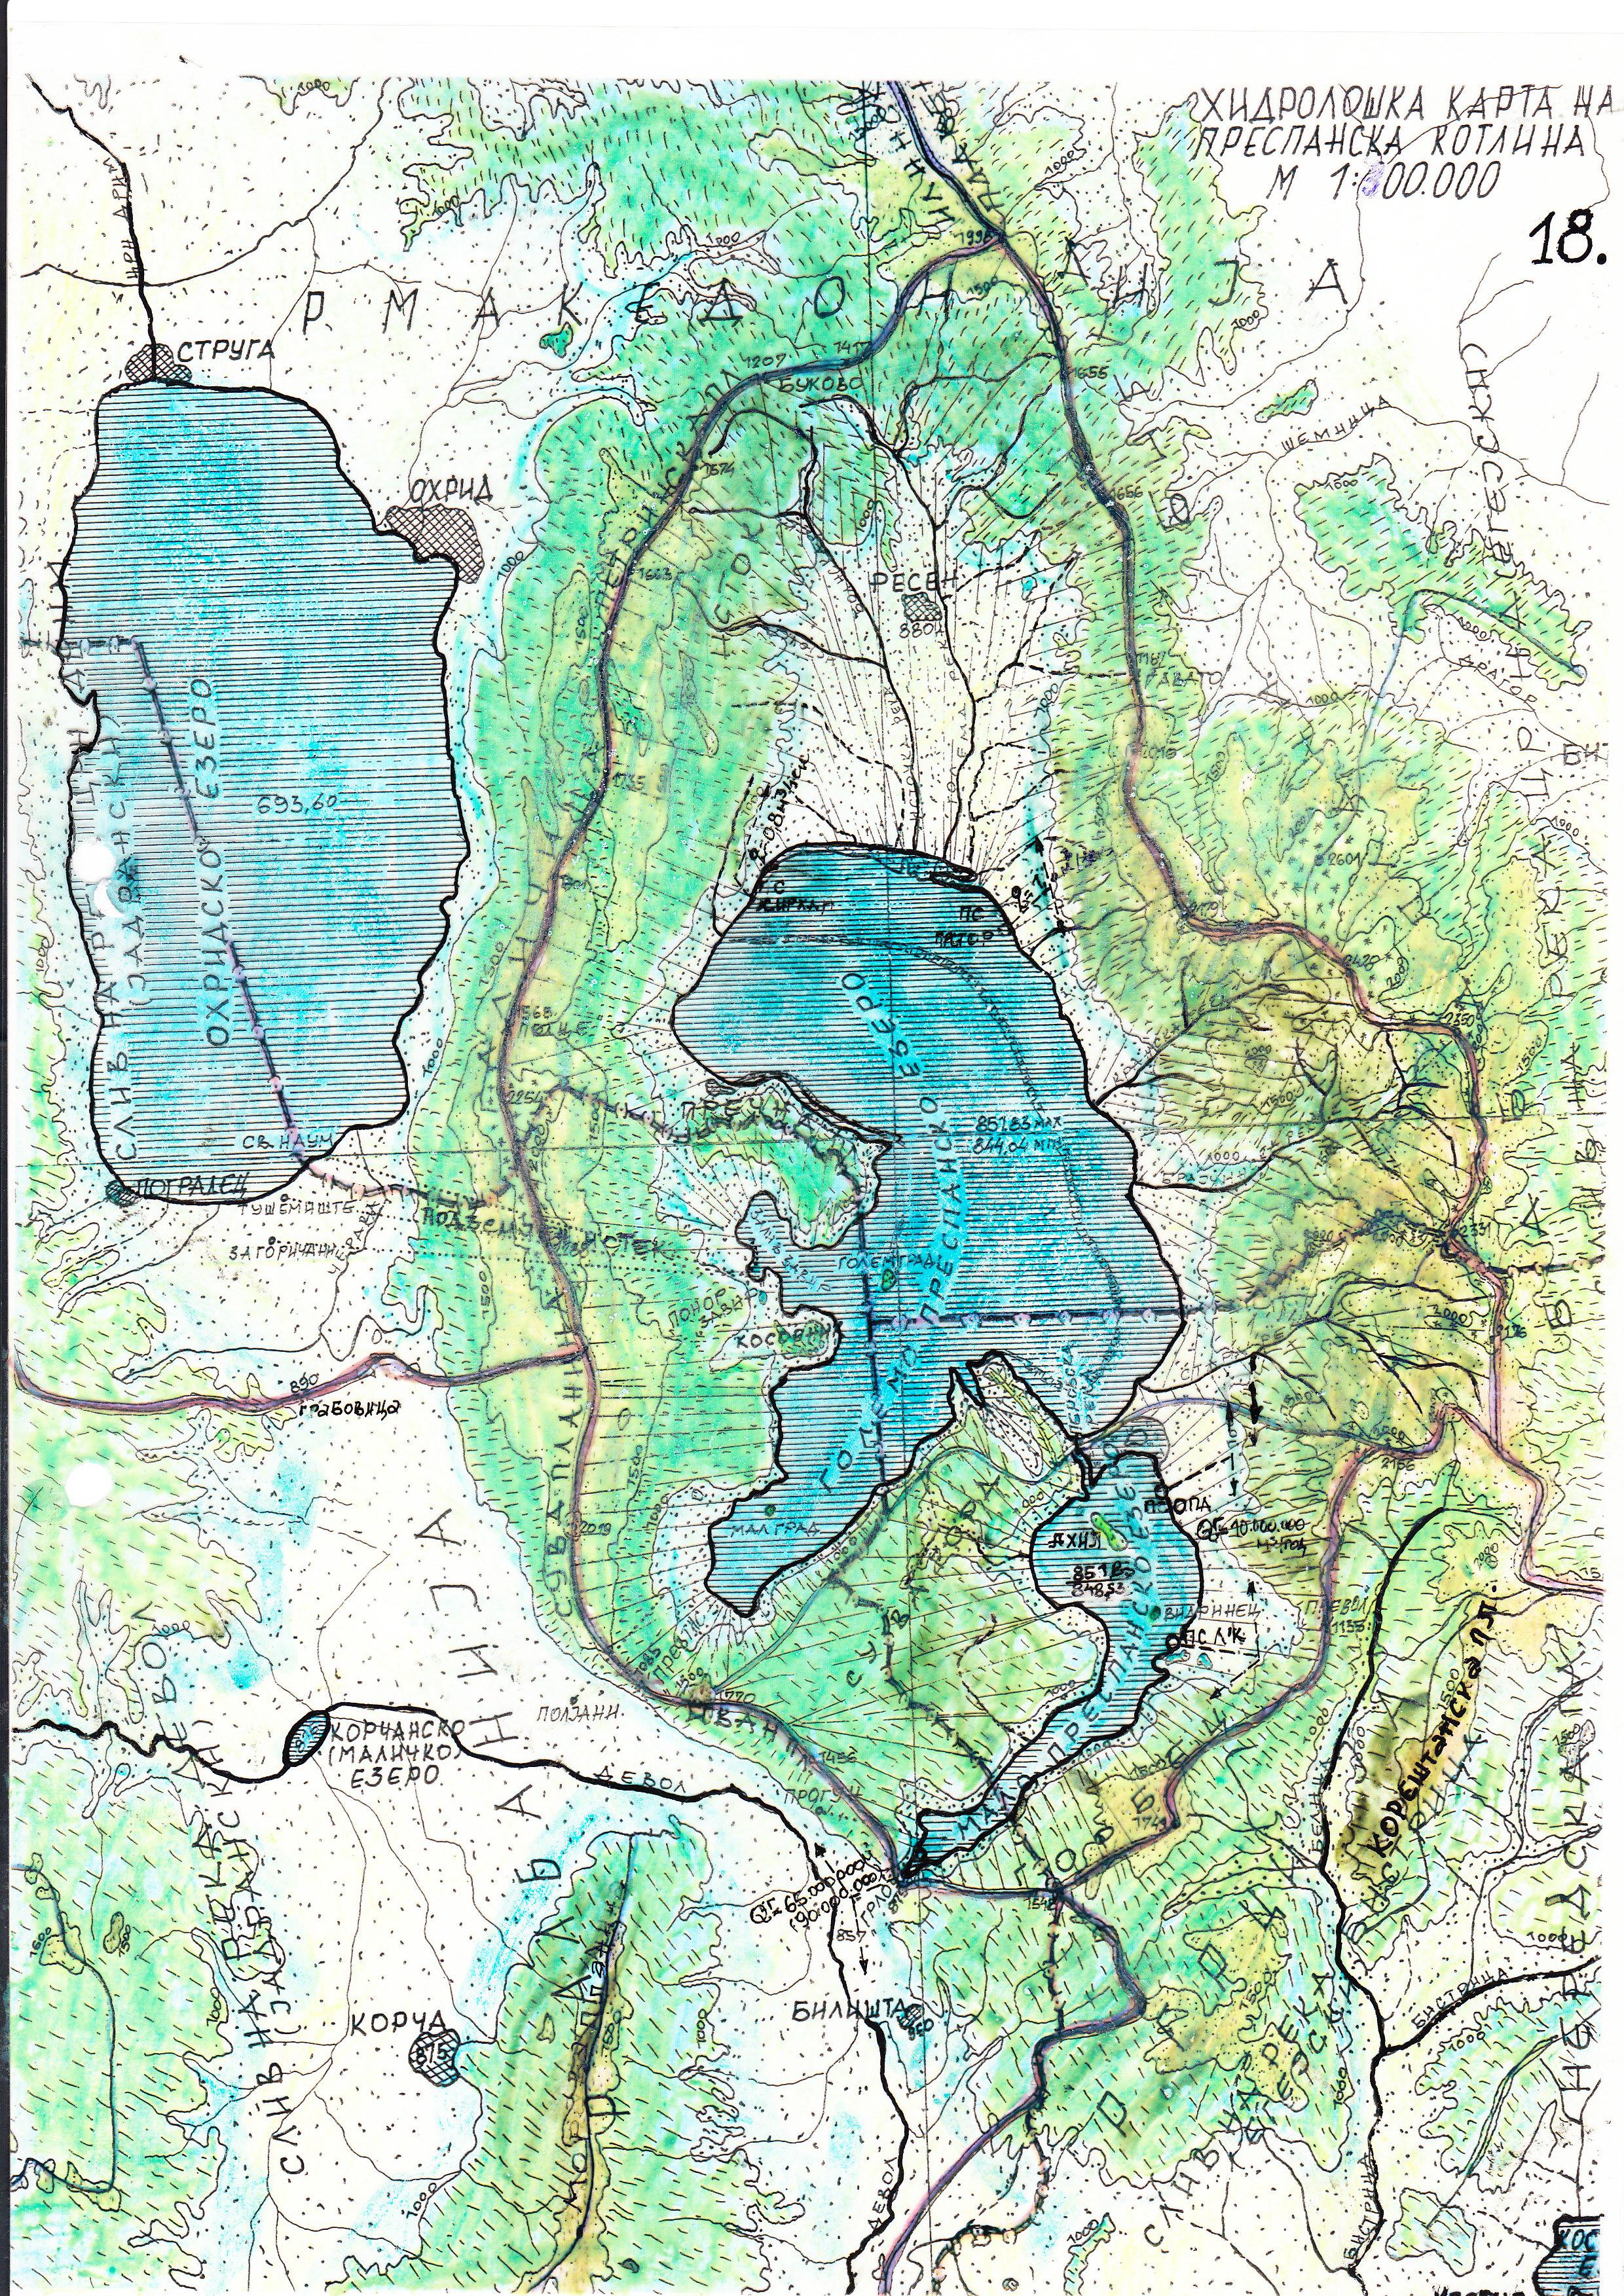 File Skenirana Hidrografska Karta Avtor M R Ilija Cavkalovski Jpg